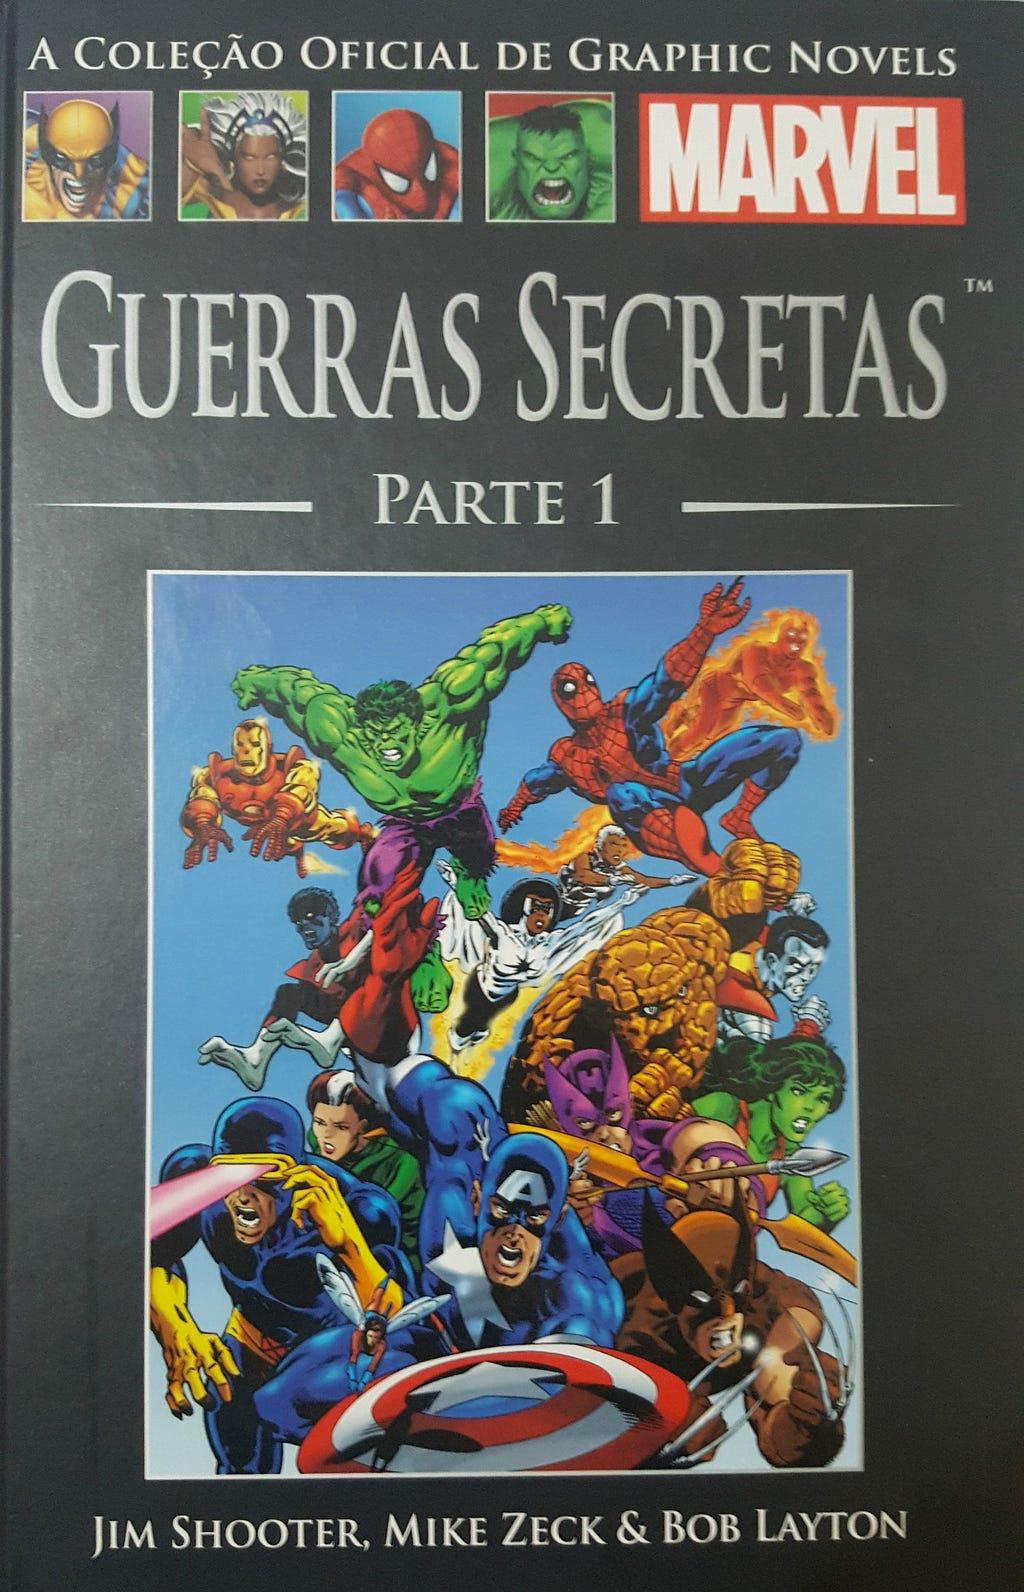 Guerras Secretas1